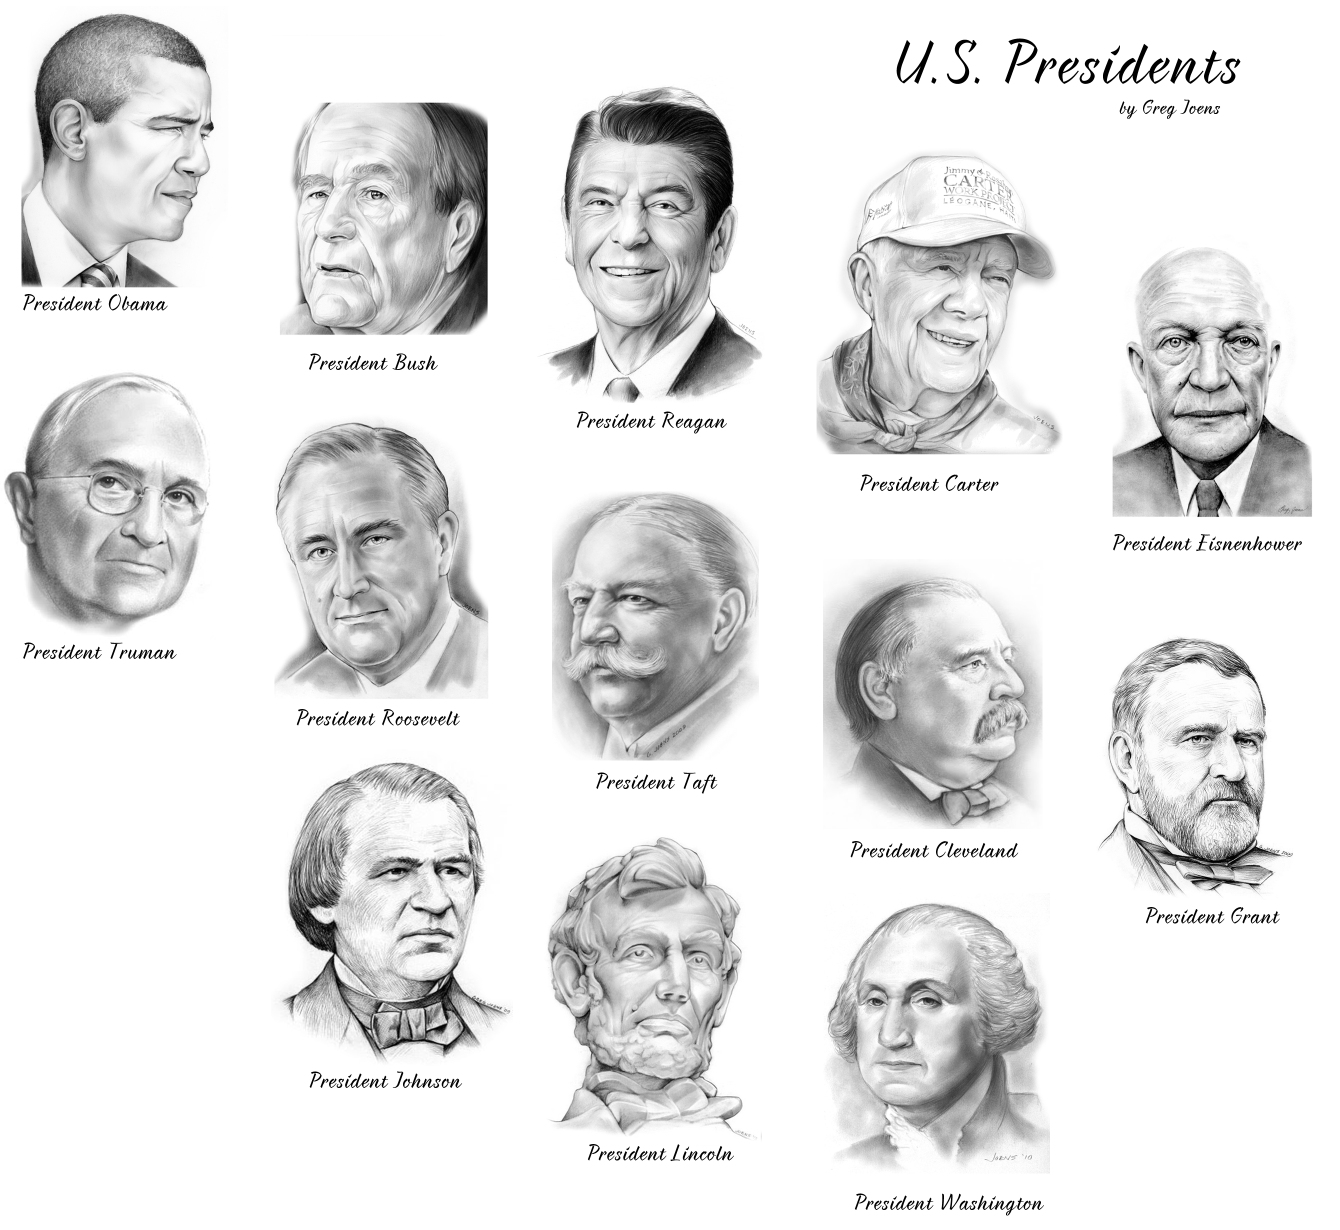 President sketches by Greg Joens. Obama, Bush, Reagan, Carter ...